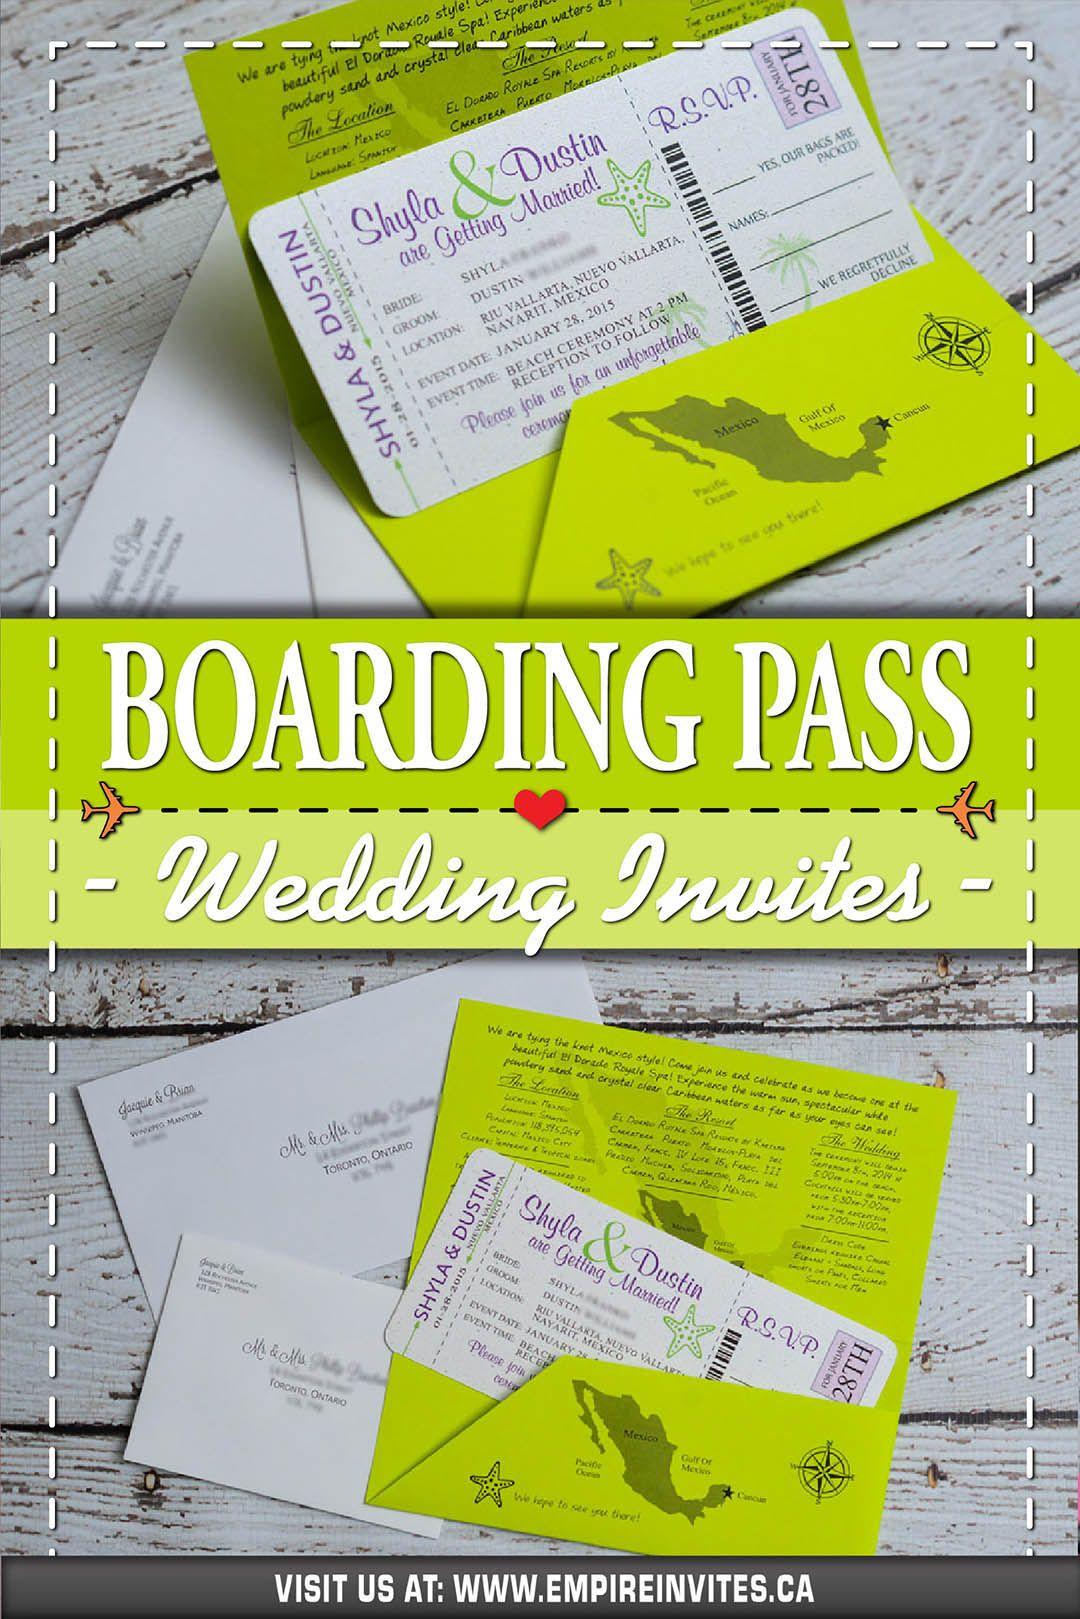 Neon Green Boarding pass wedding invitations for a destination wedd… |  Boarding pass wedding invitation, Unique destination wedding invitations, Wedding  invitations